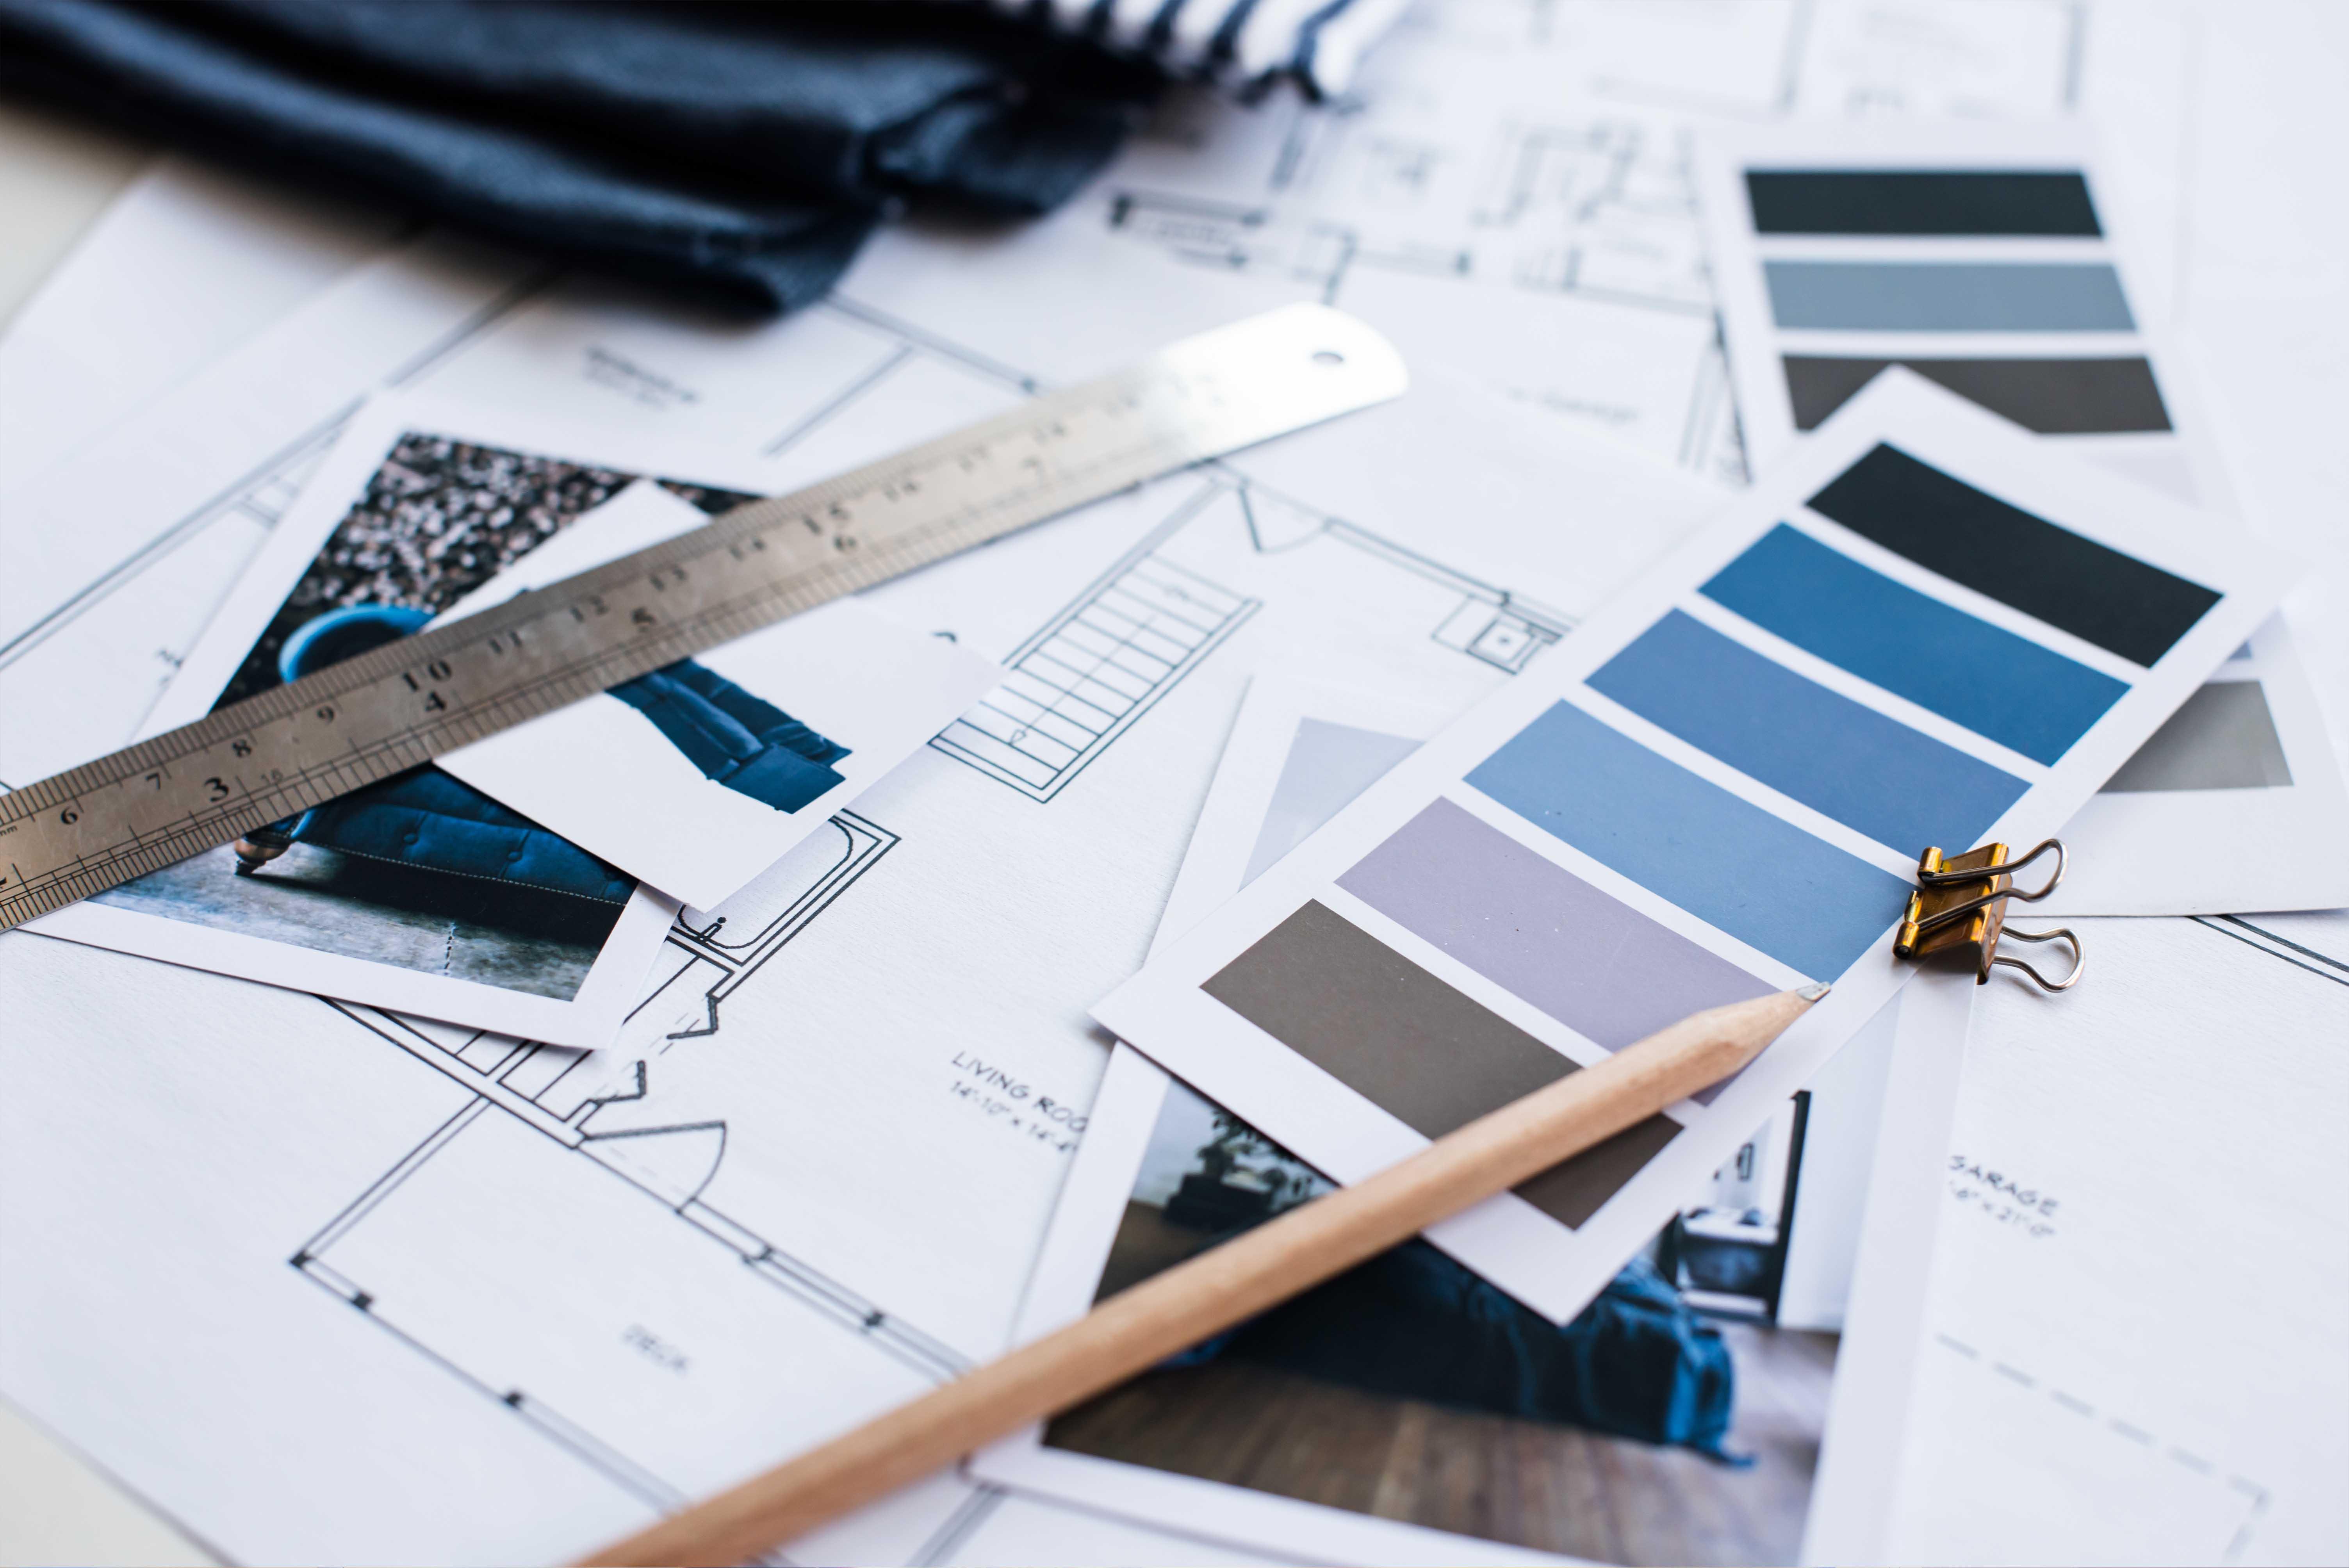 colouring perception design ncs. Black Bedroom Furniture Sets. Home Design Ideas